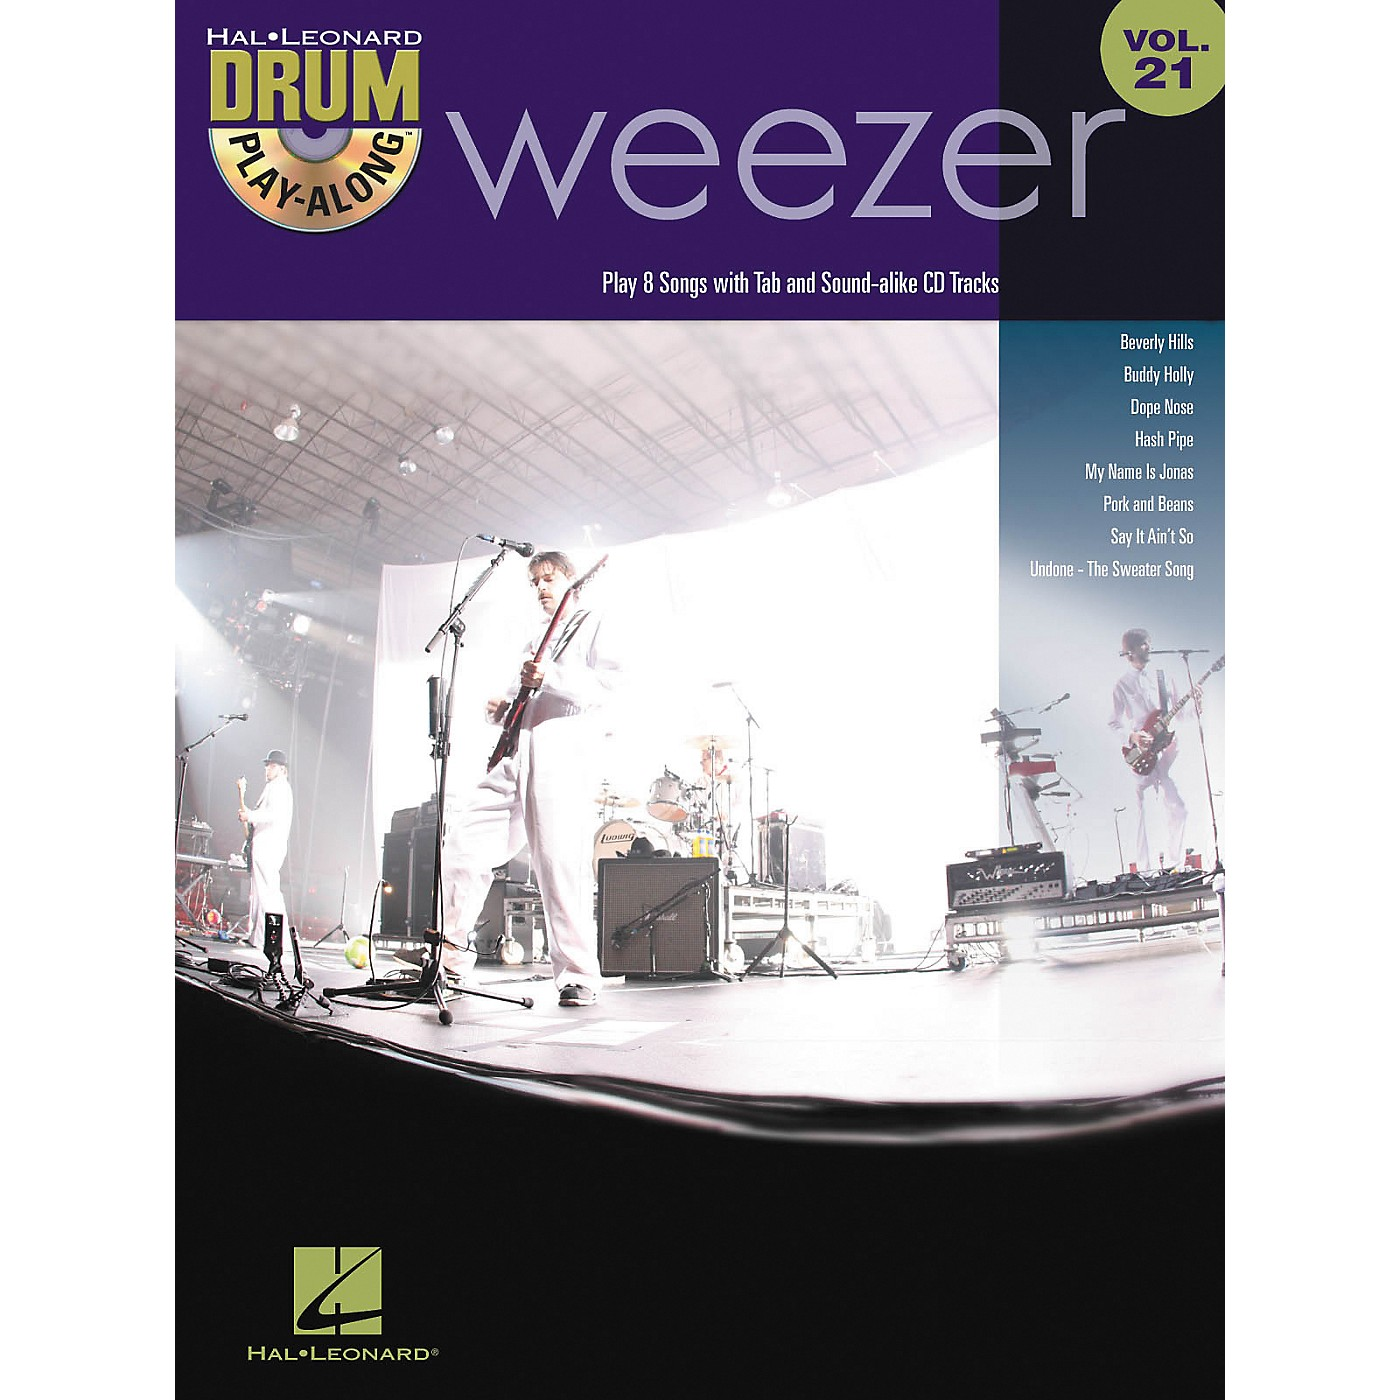 Hal Leonard Weezer - Drum Play-Along Volume 21 Book/CD thumbnail